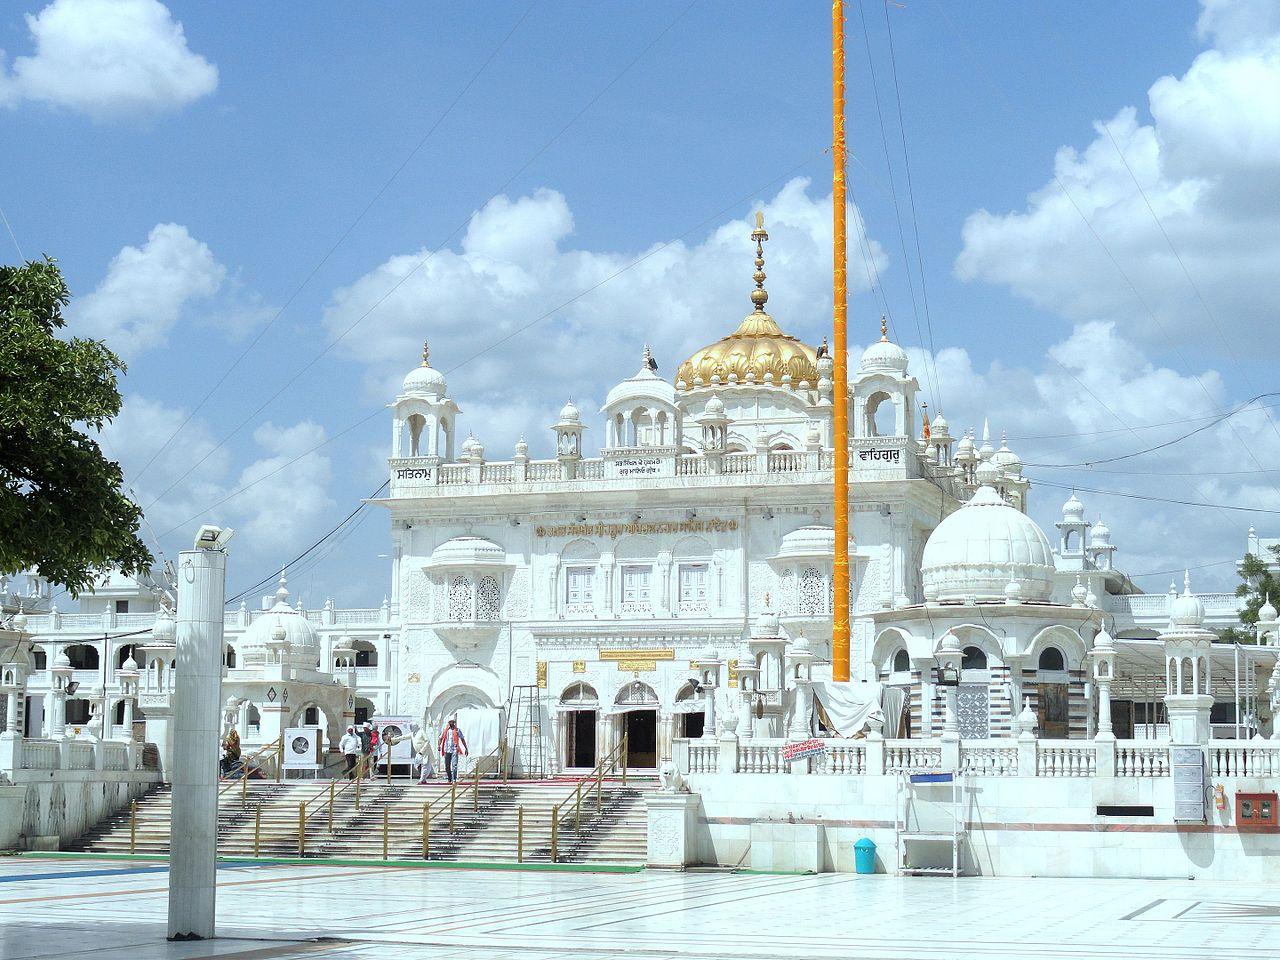 Hazur Sahib - One of the Takhts of Sikhism in Nanded, Maharashtra